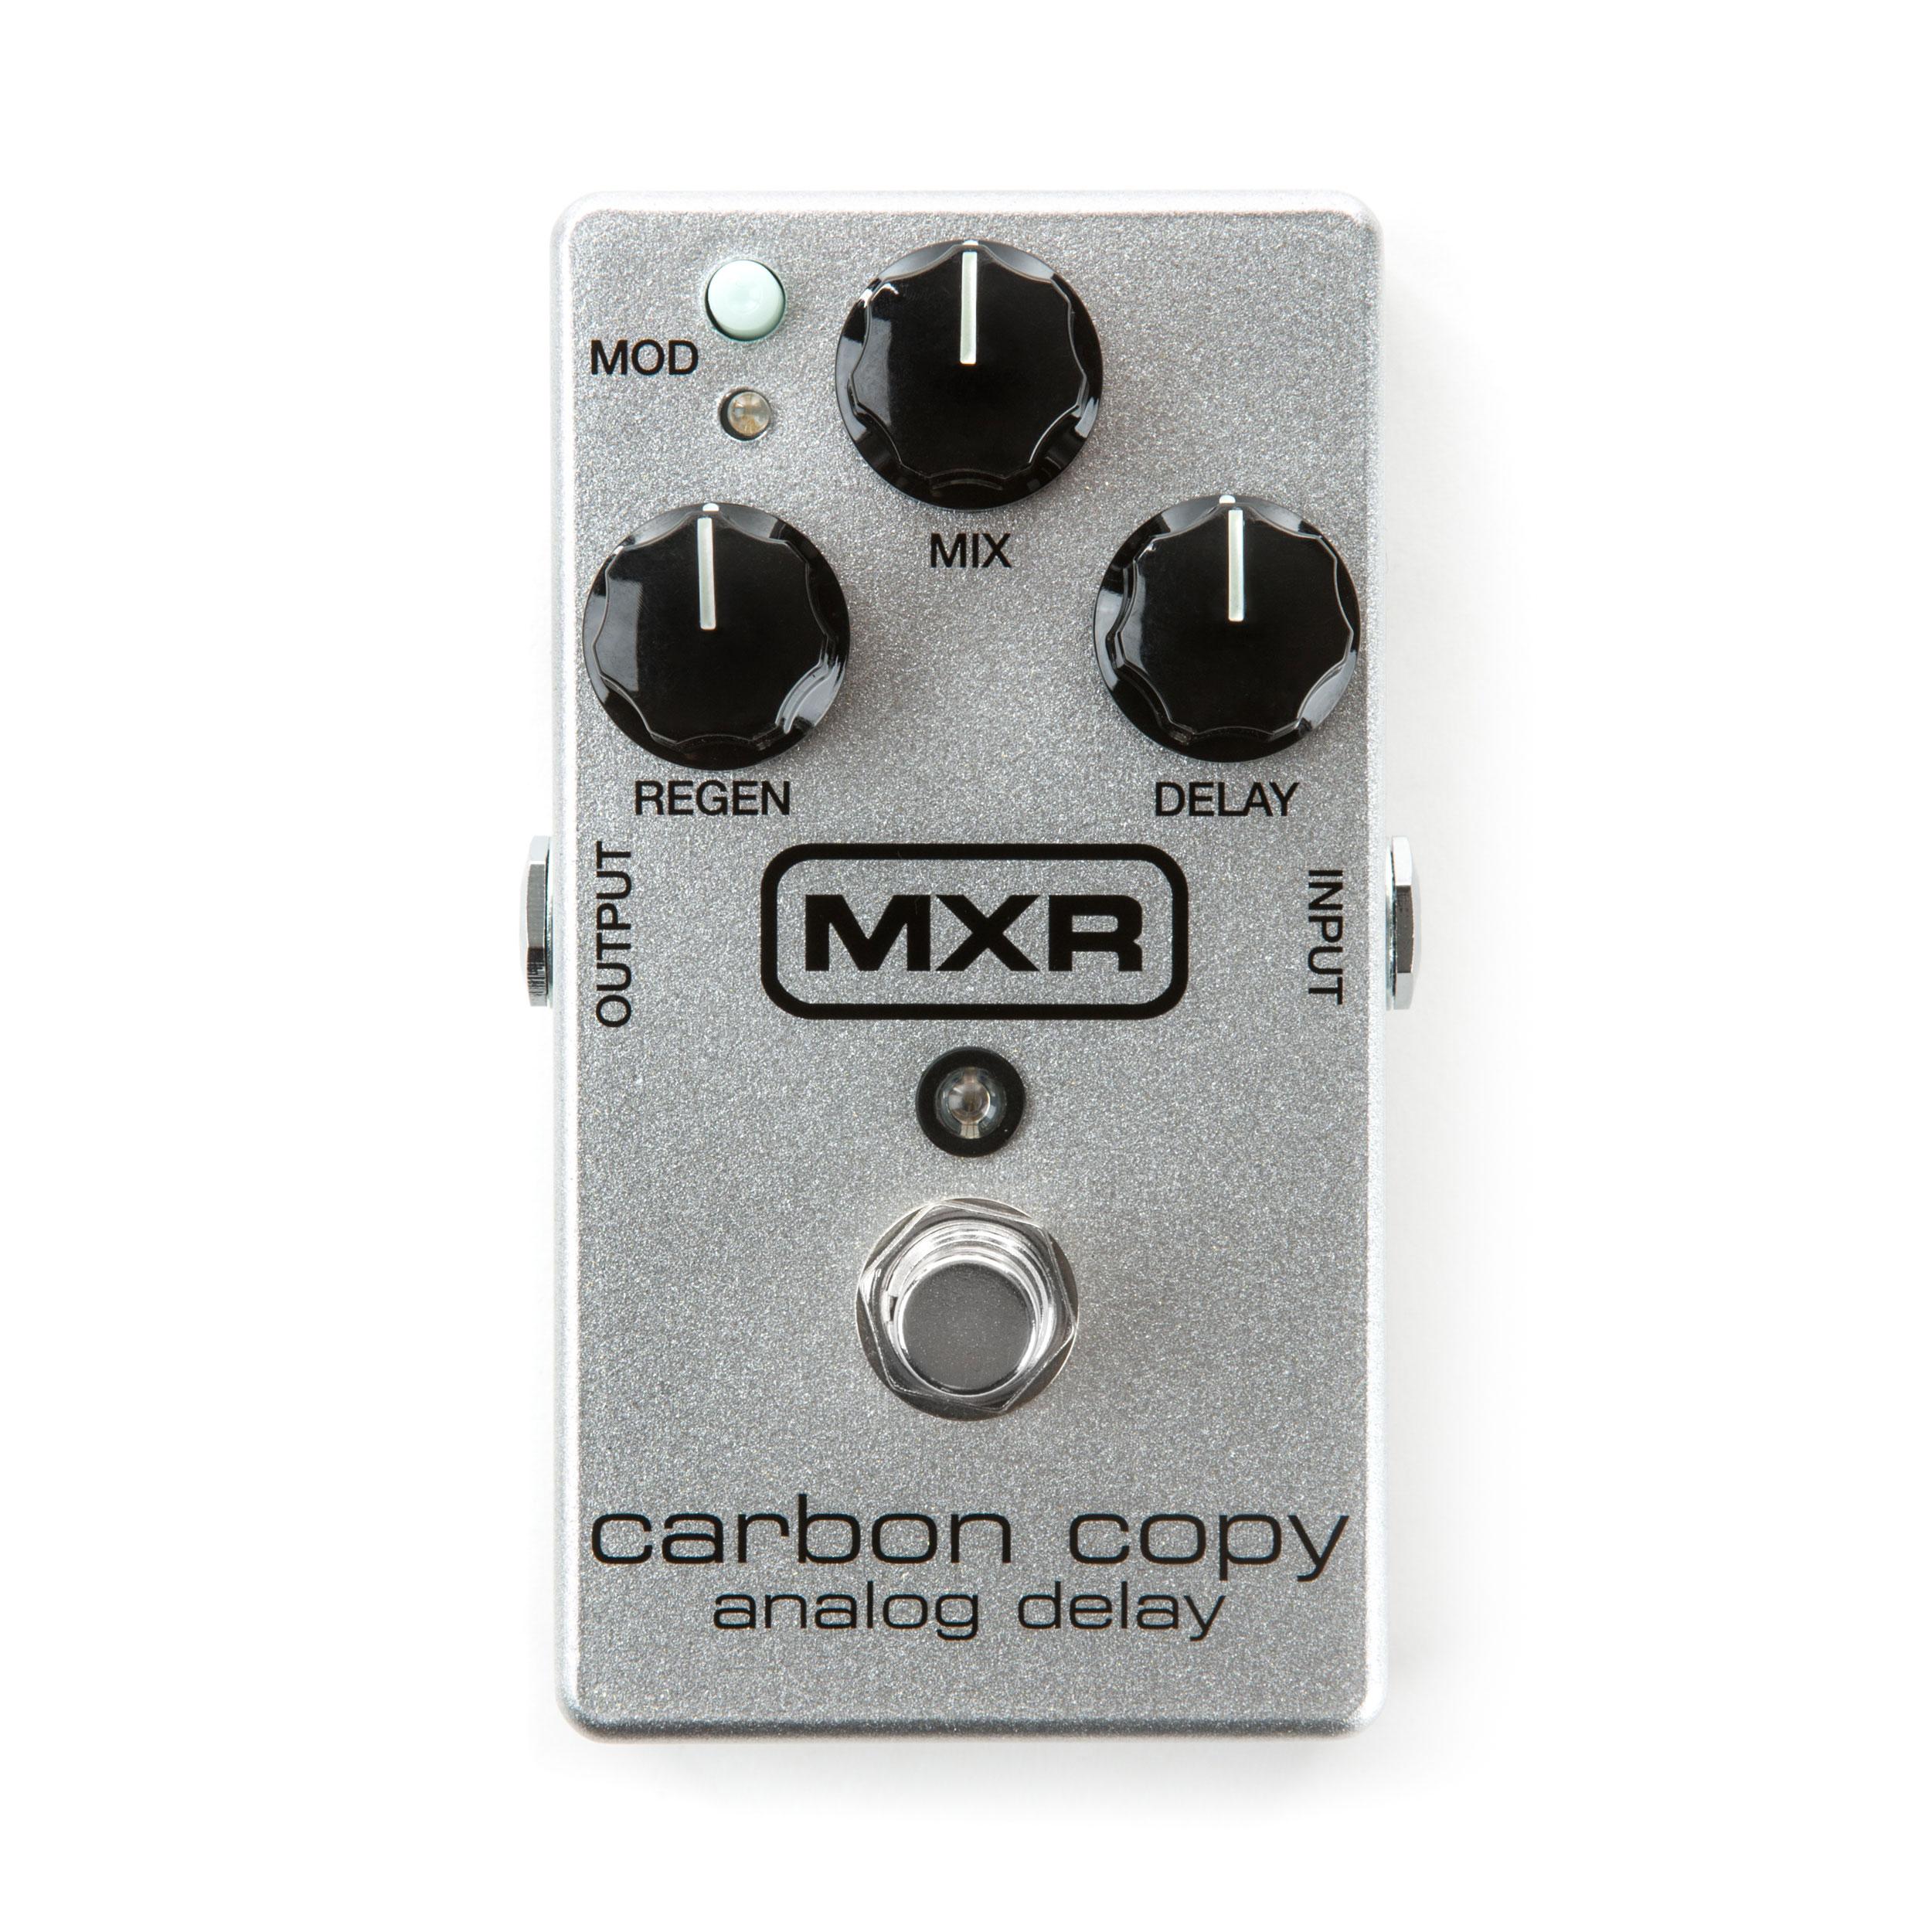 MXR   Electronics   Products 2500x2500